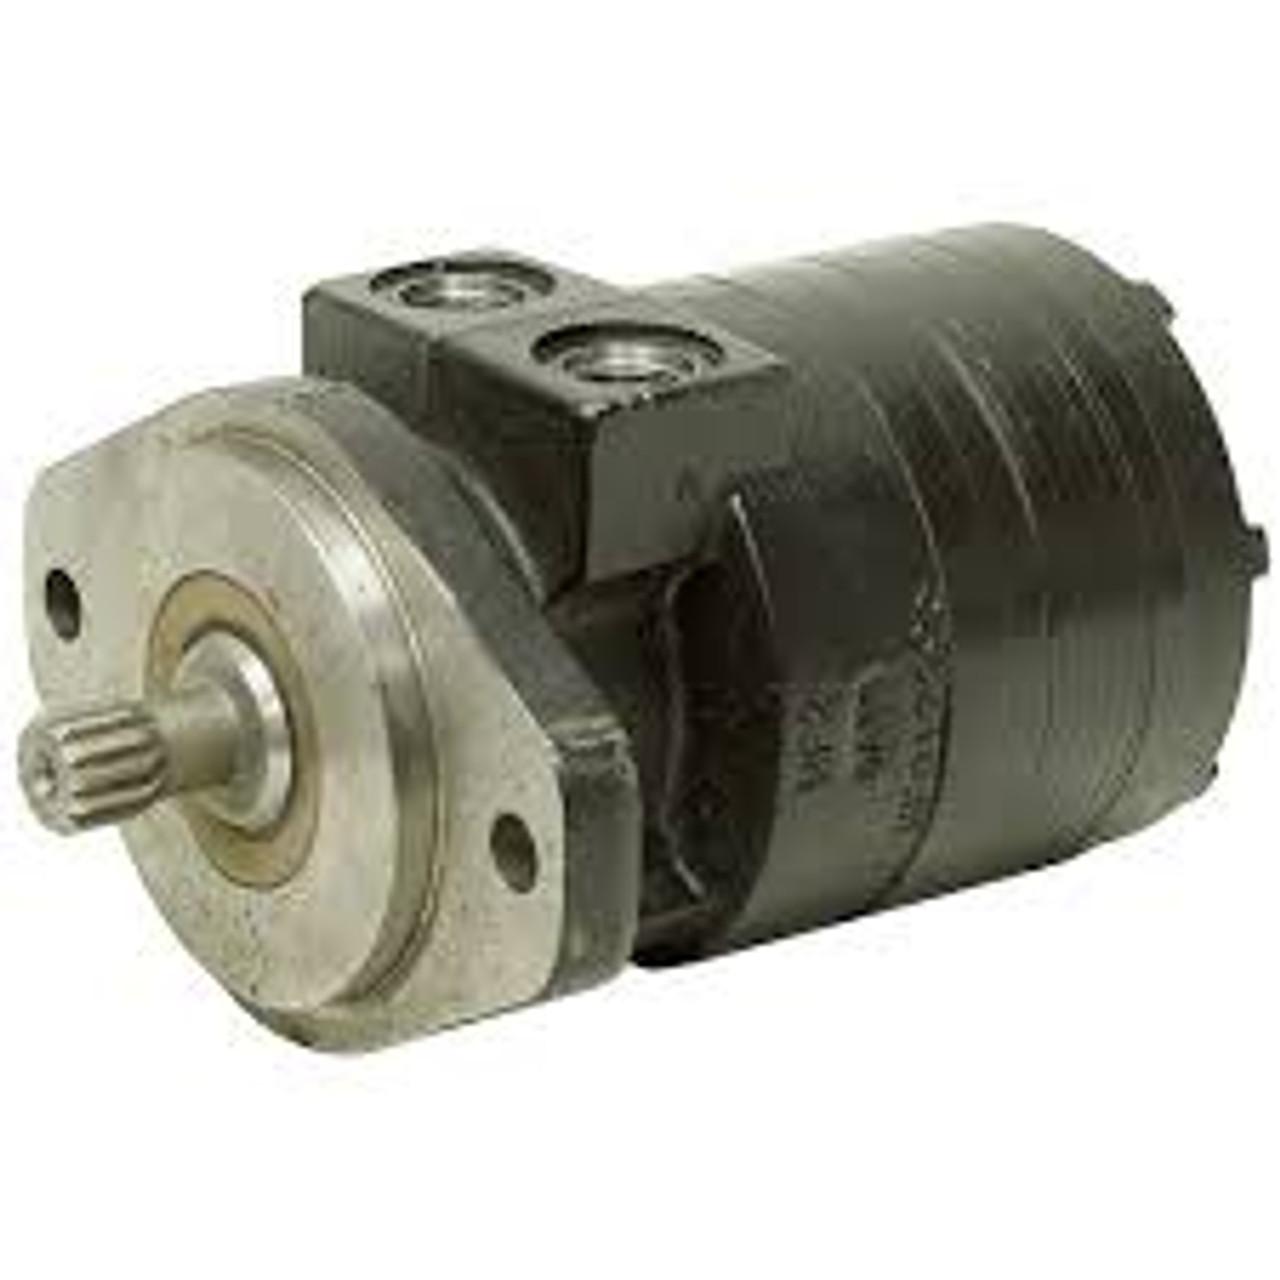 Hydraulic Orbital Motors, Low Speed High Torque Motors, Genuine Metaris,  Roller-Star, Geroter